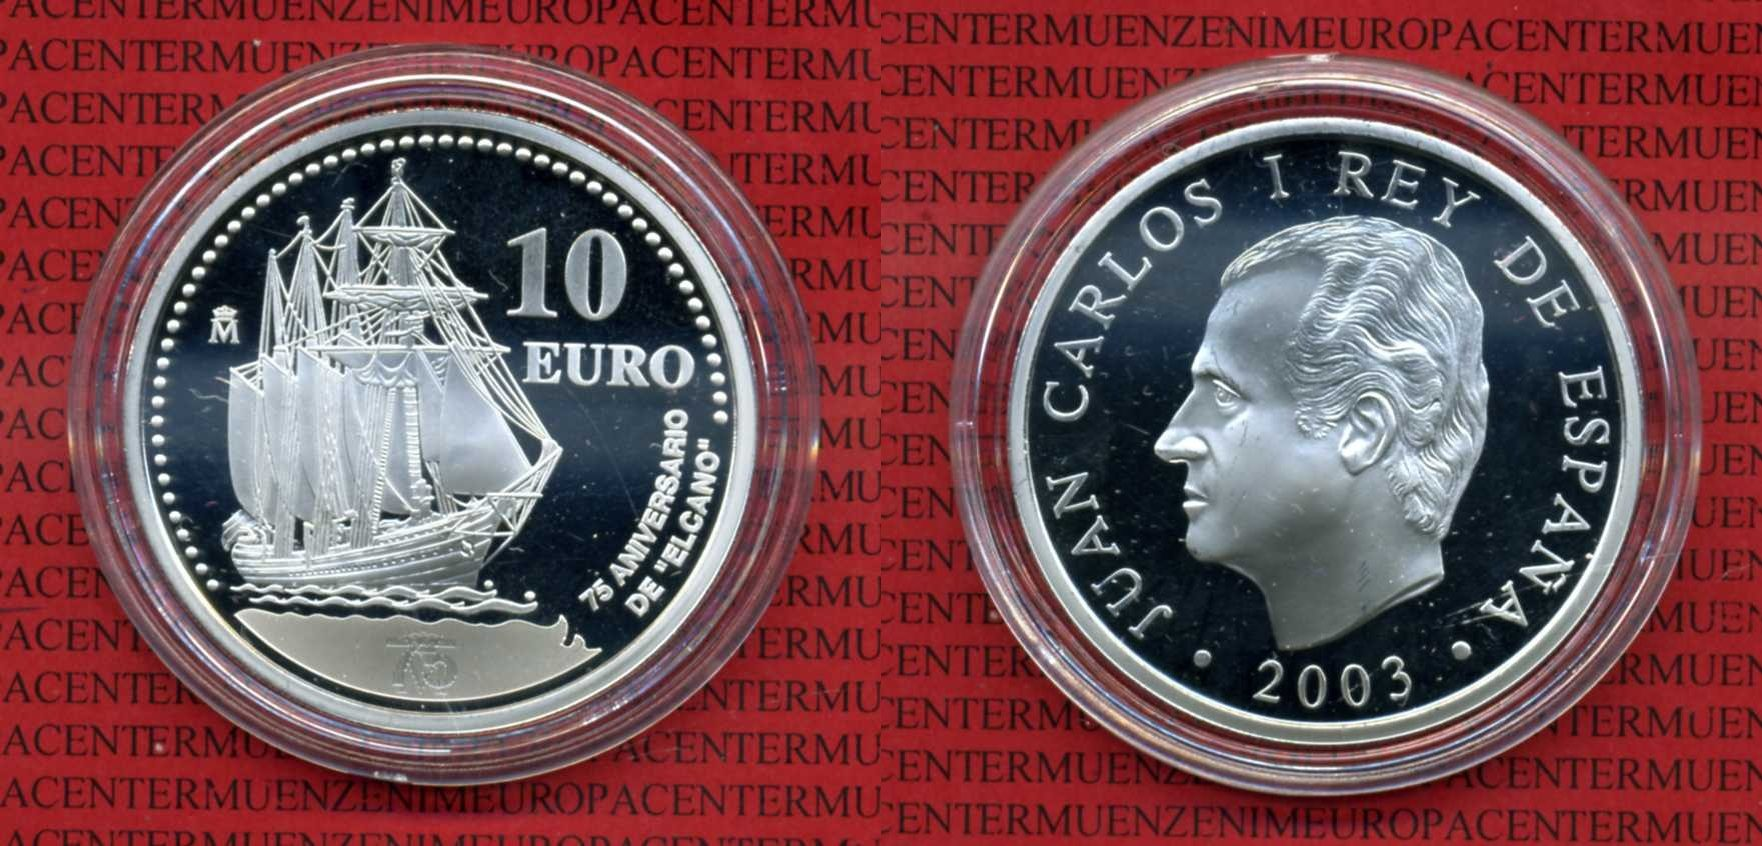 10 Euro Silbermünze 2003 Spanien Spanien 10 Euro 2003 Schiffsmotiv - Elcano - Kapsel proof